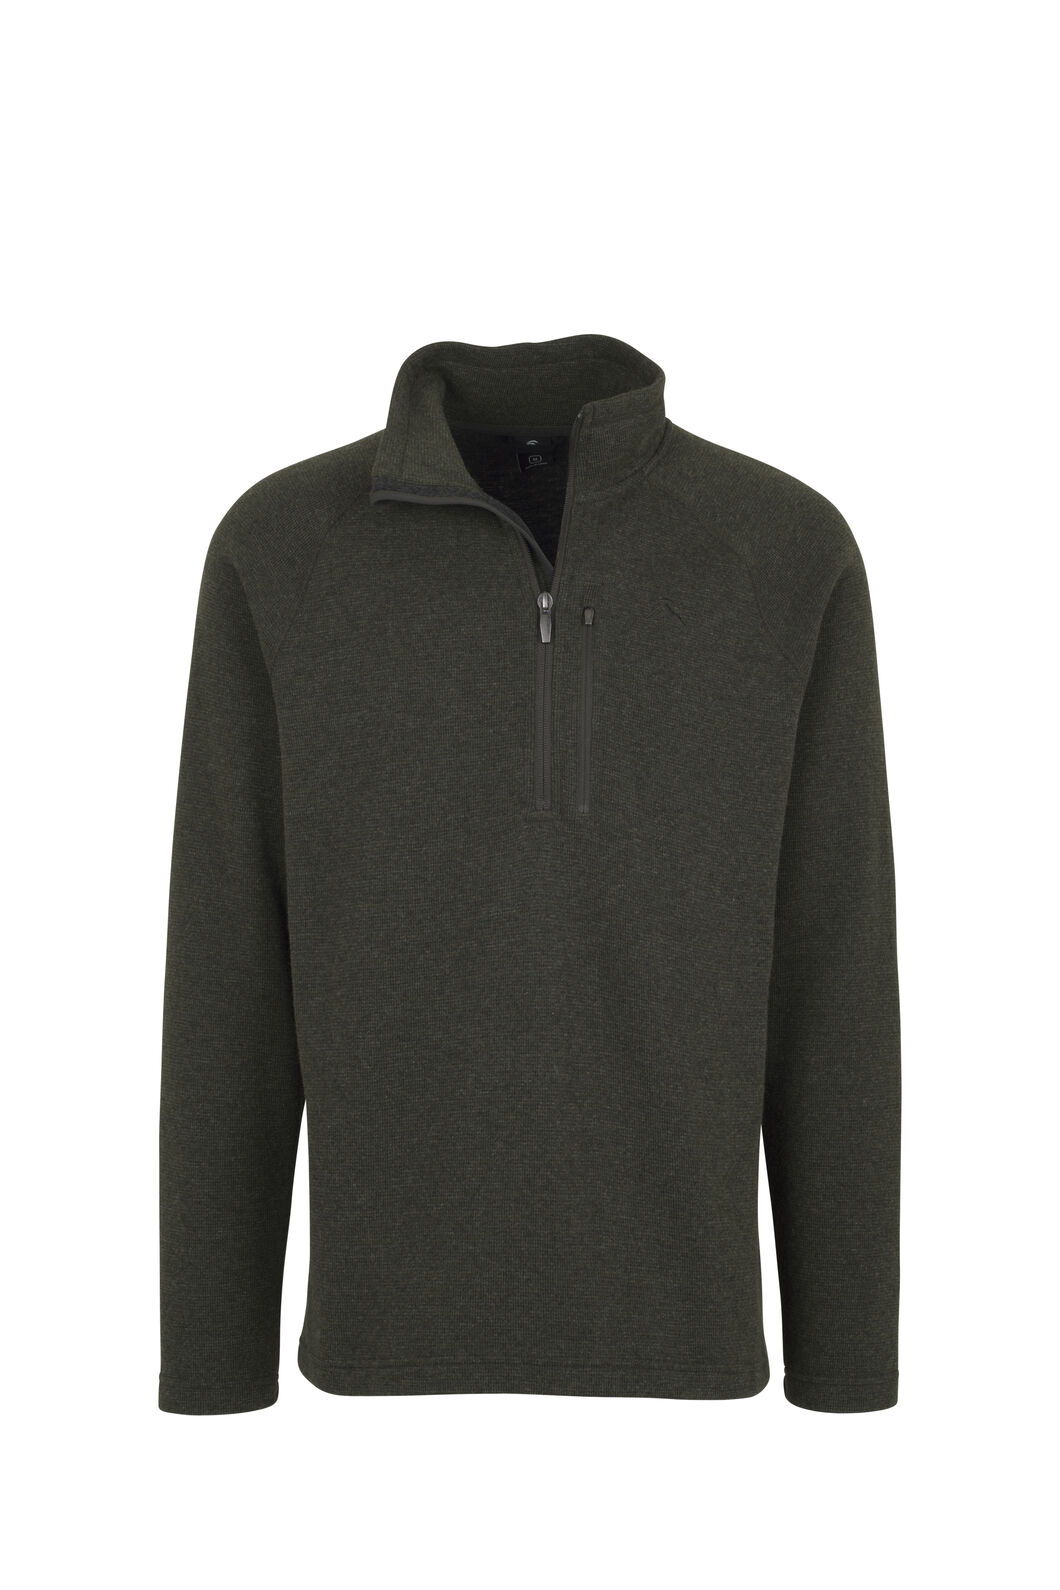 Macpac Guyon Half Zip Pullover - Men's, Green, hi-res